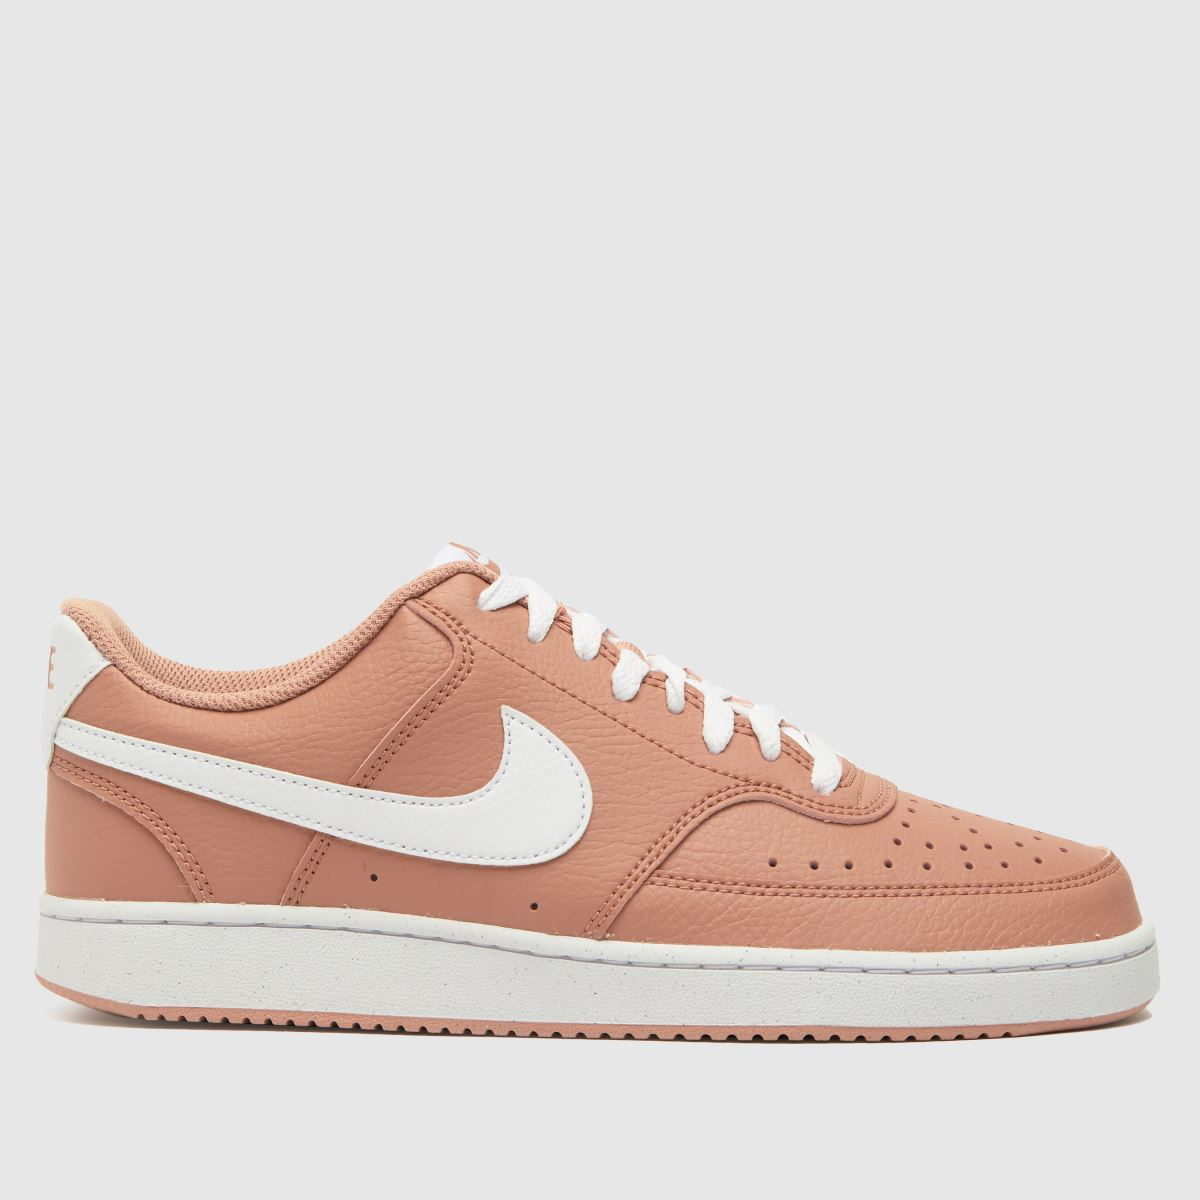 Nike Lilac Air Max 270 Trainers